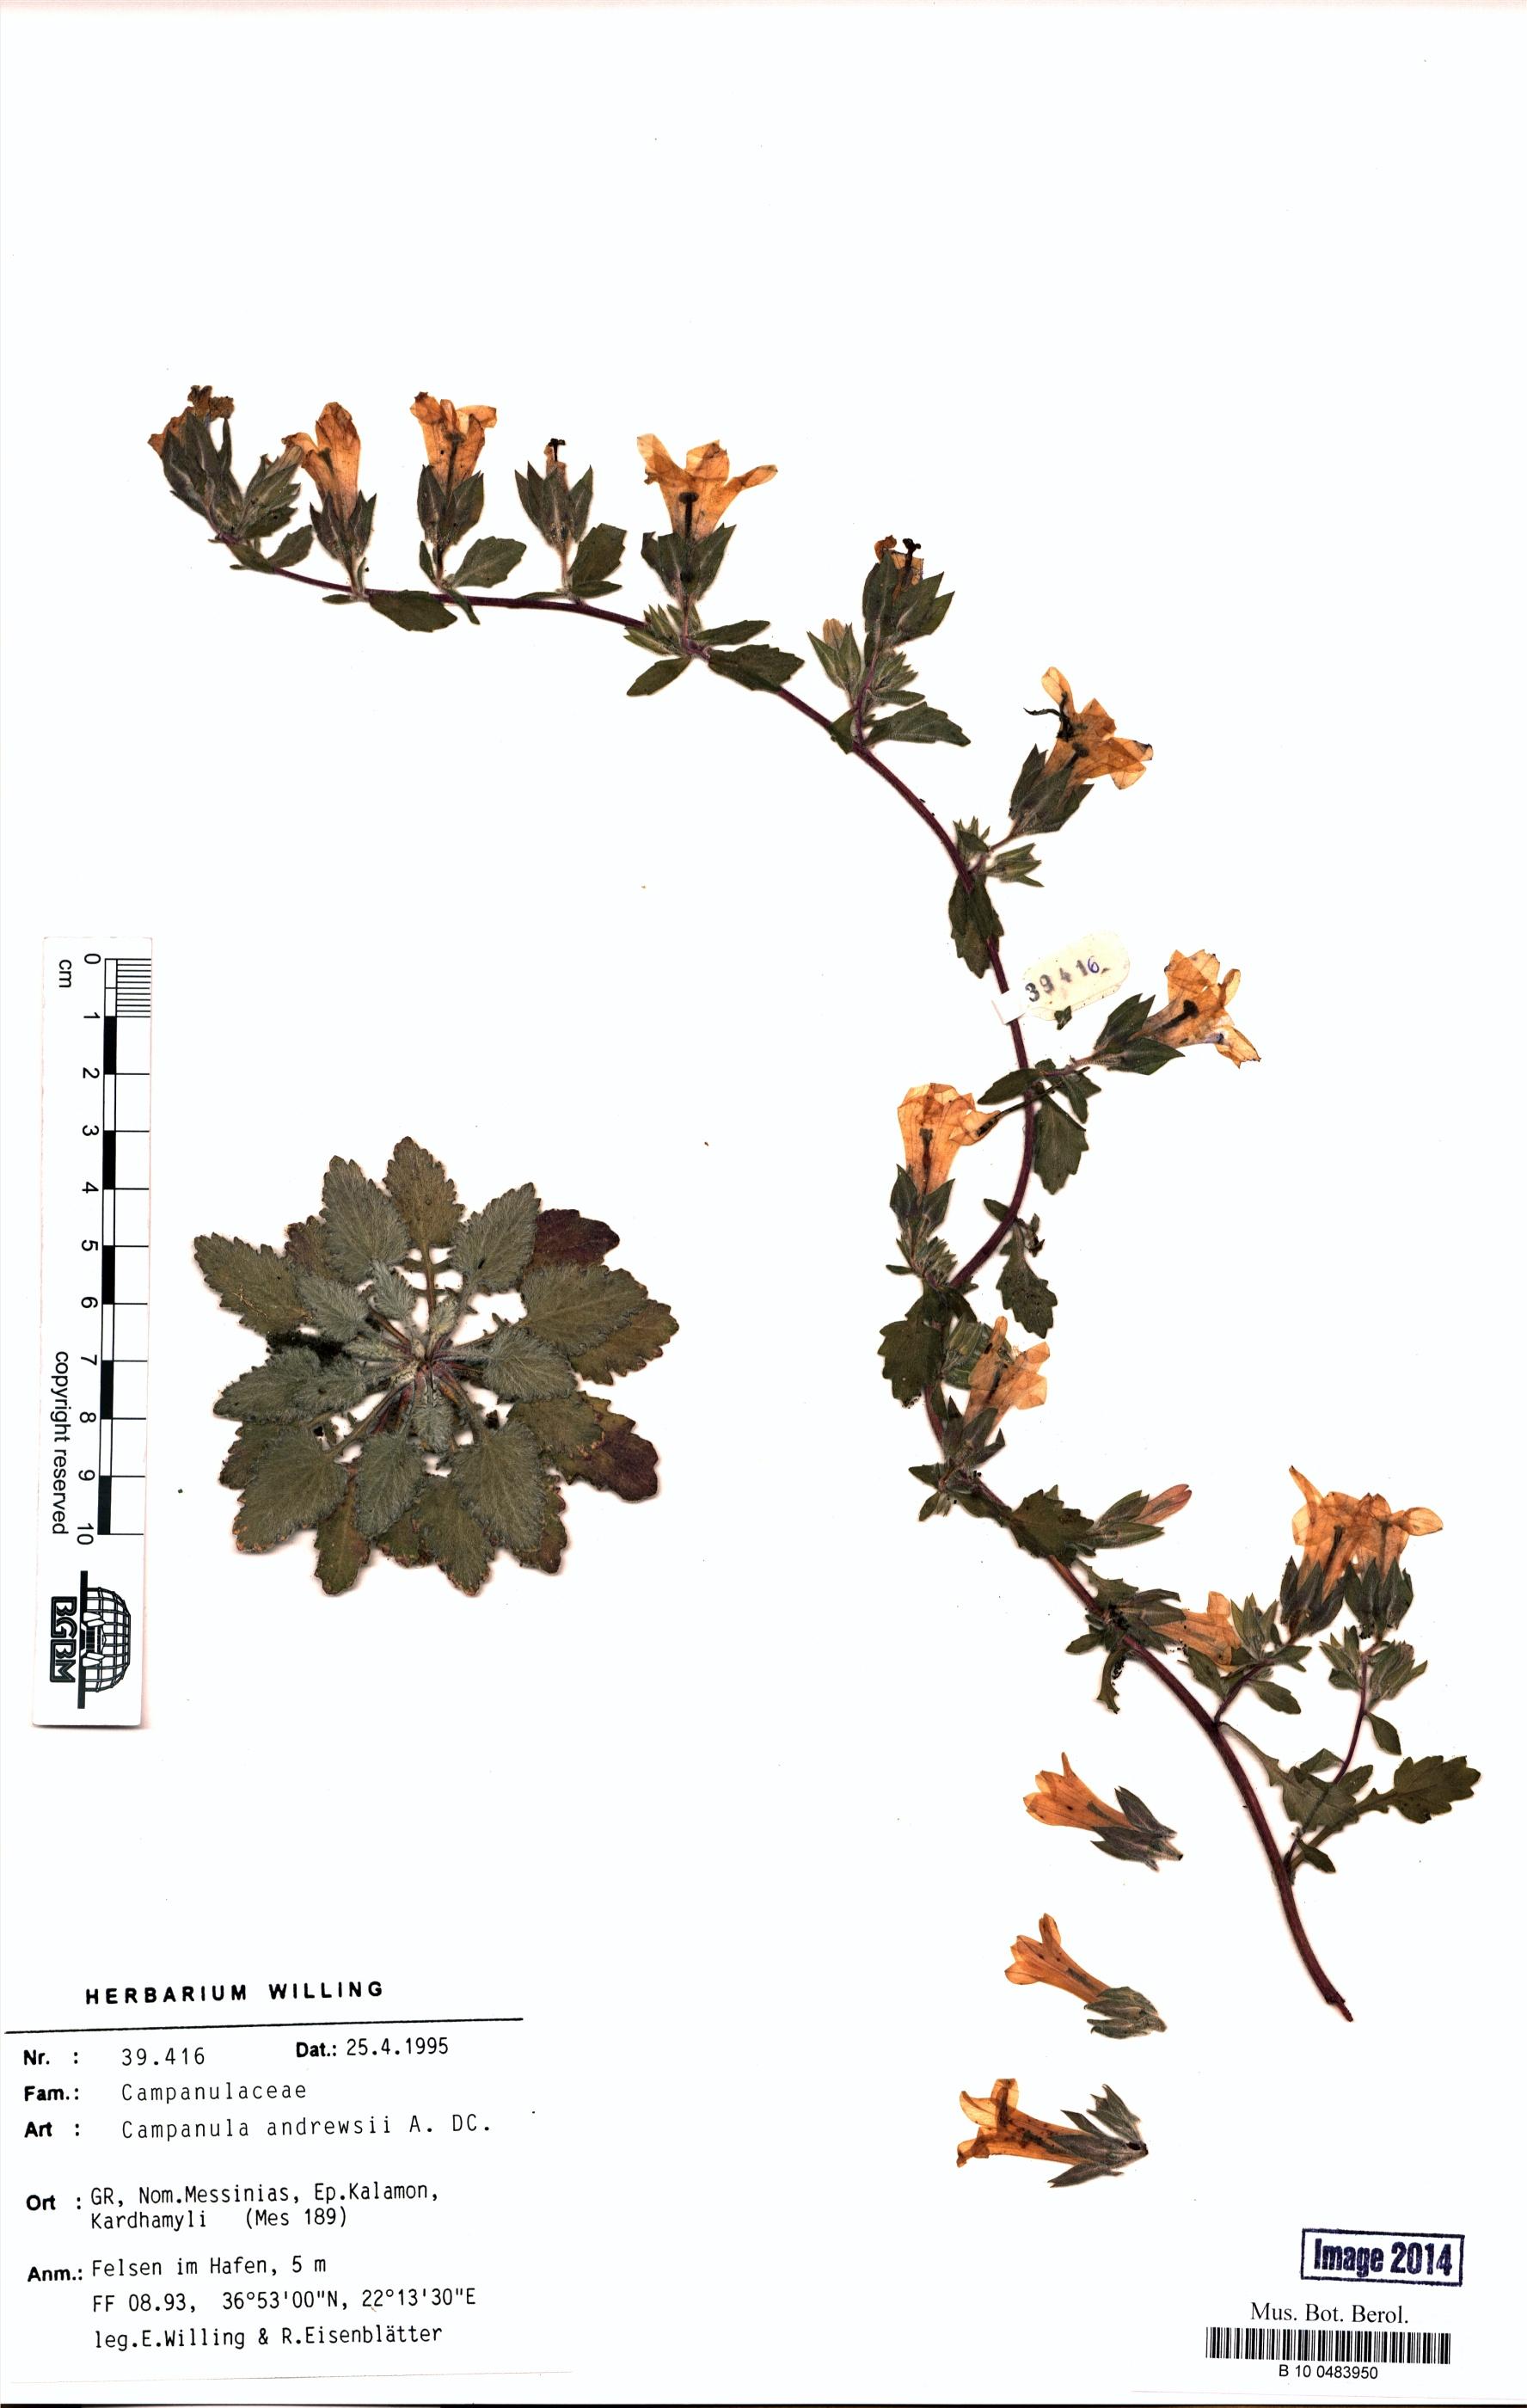 http://ww2.bgbm.org/herbarium/images/B/10/04/83/95/B_10_0483950.jpg